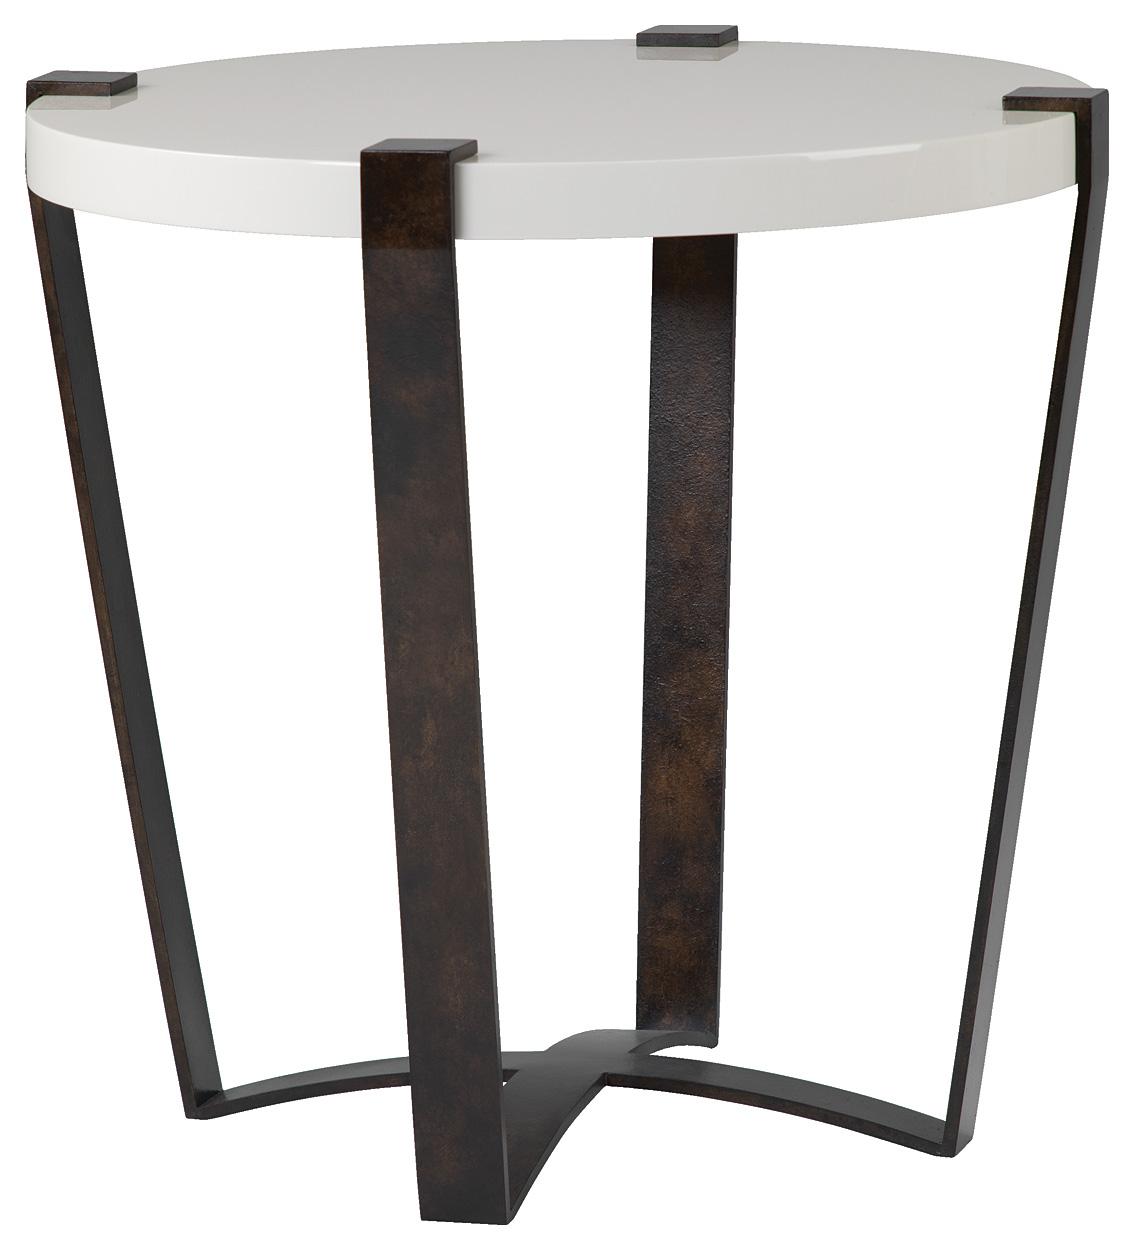 Panama Side Table Side Tables Furniture Decorus Furniture